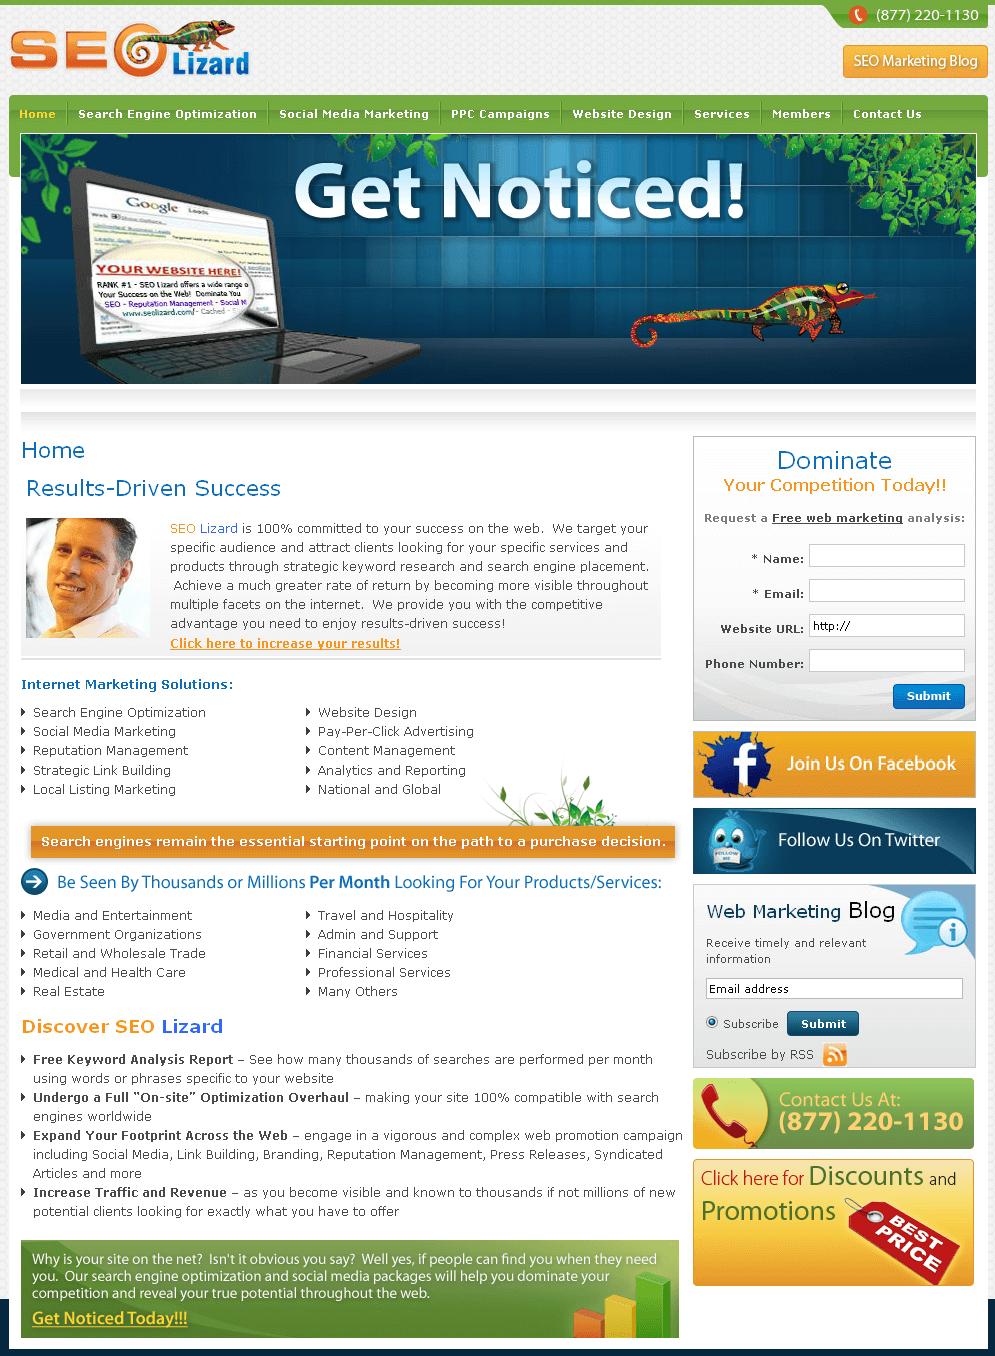 Website for Digital Marketing Agency 'SEO Lizard' Using PHP